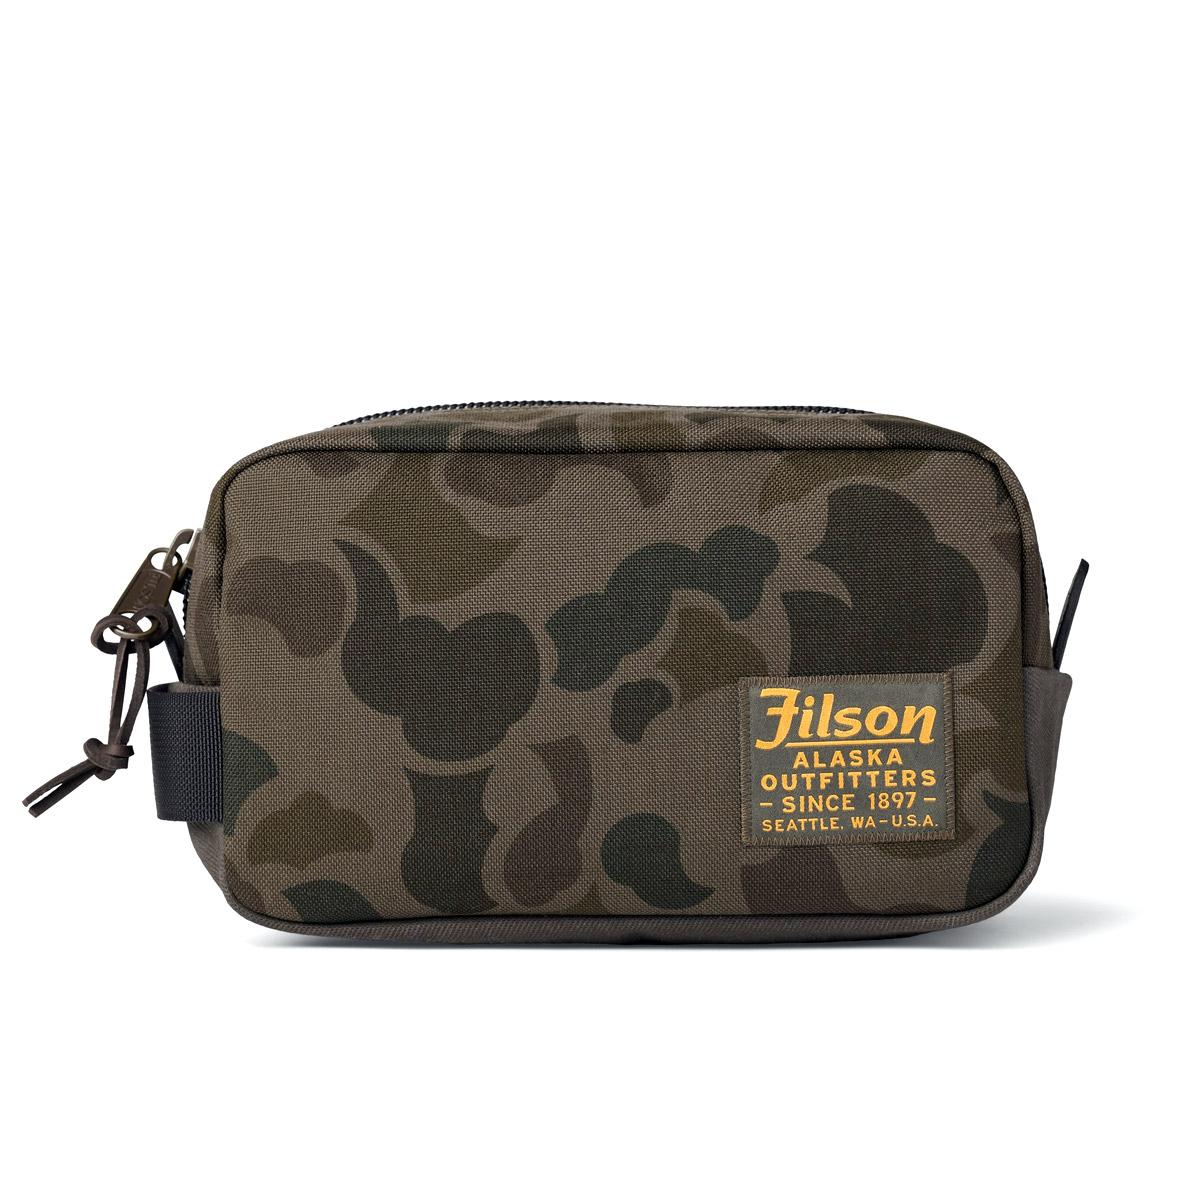 Filson Travel Pack 20186528-Dark Shrub Camo